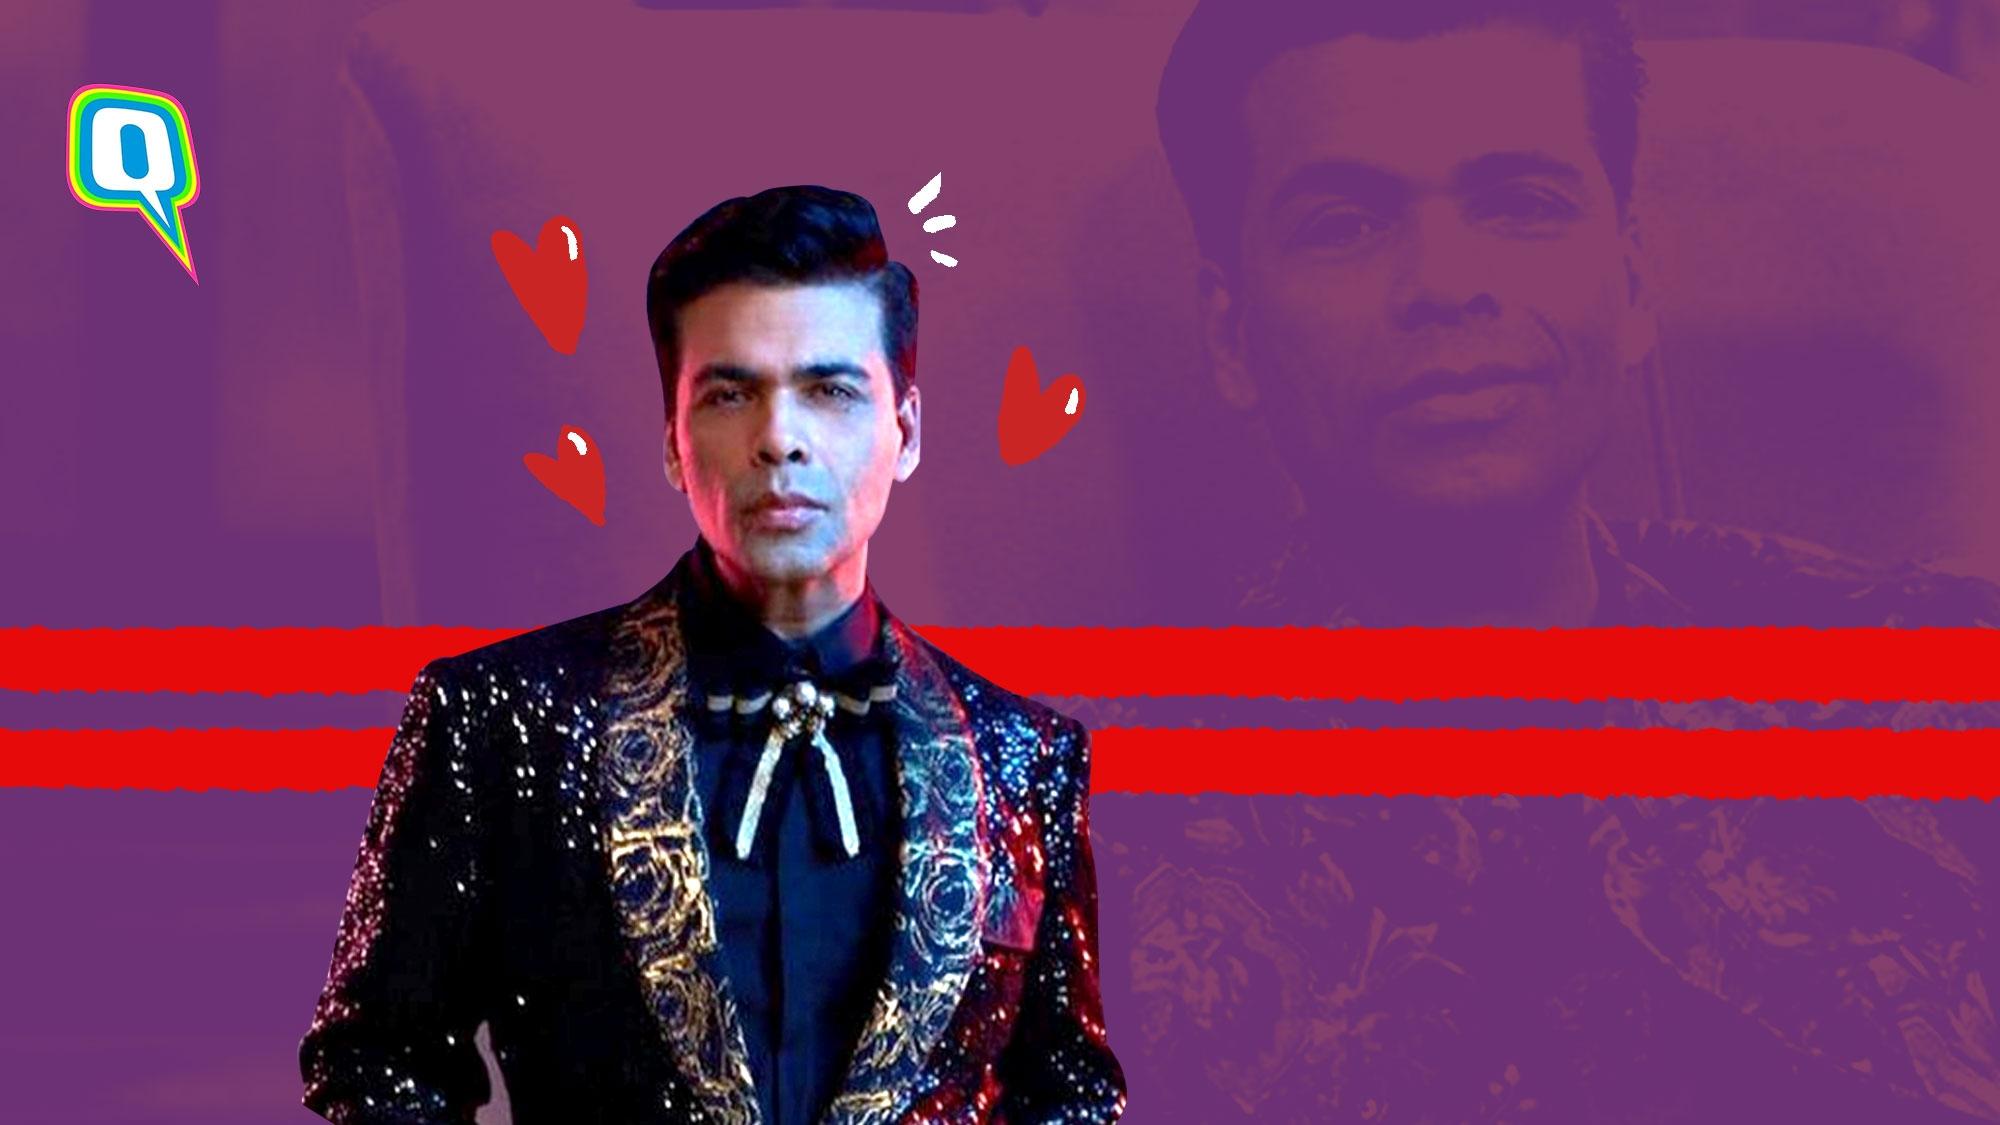 'What The Love' Looks Like Netflix's Splitsvilla feat. Karan Johar